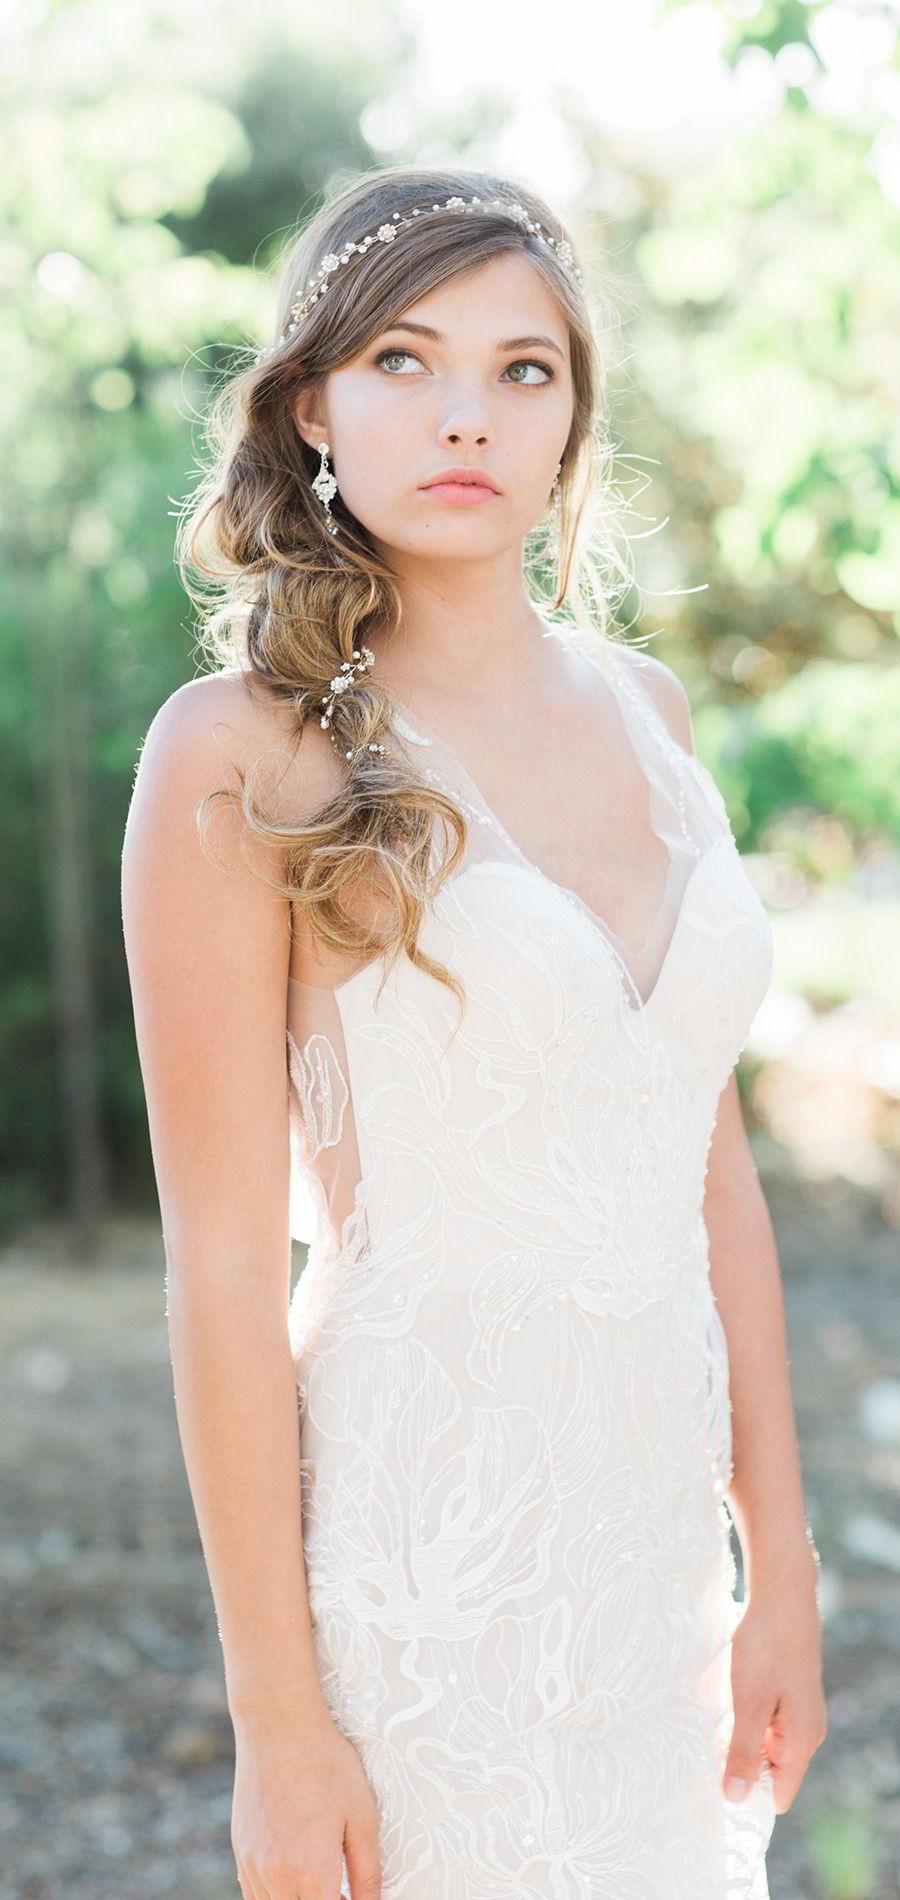 bel aire bridal accessories 6751 delicate hair vine accessory v neck wedding dress